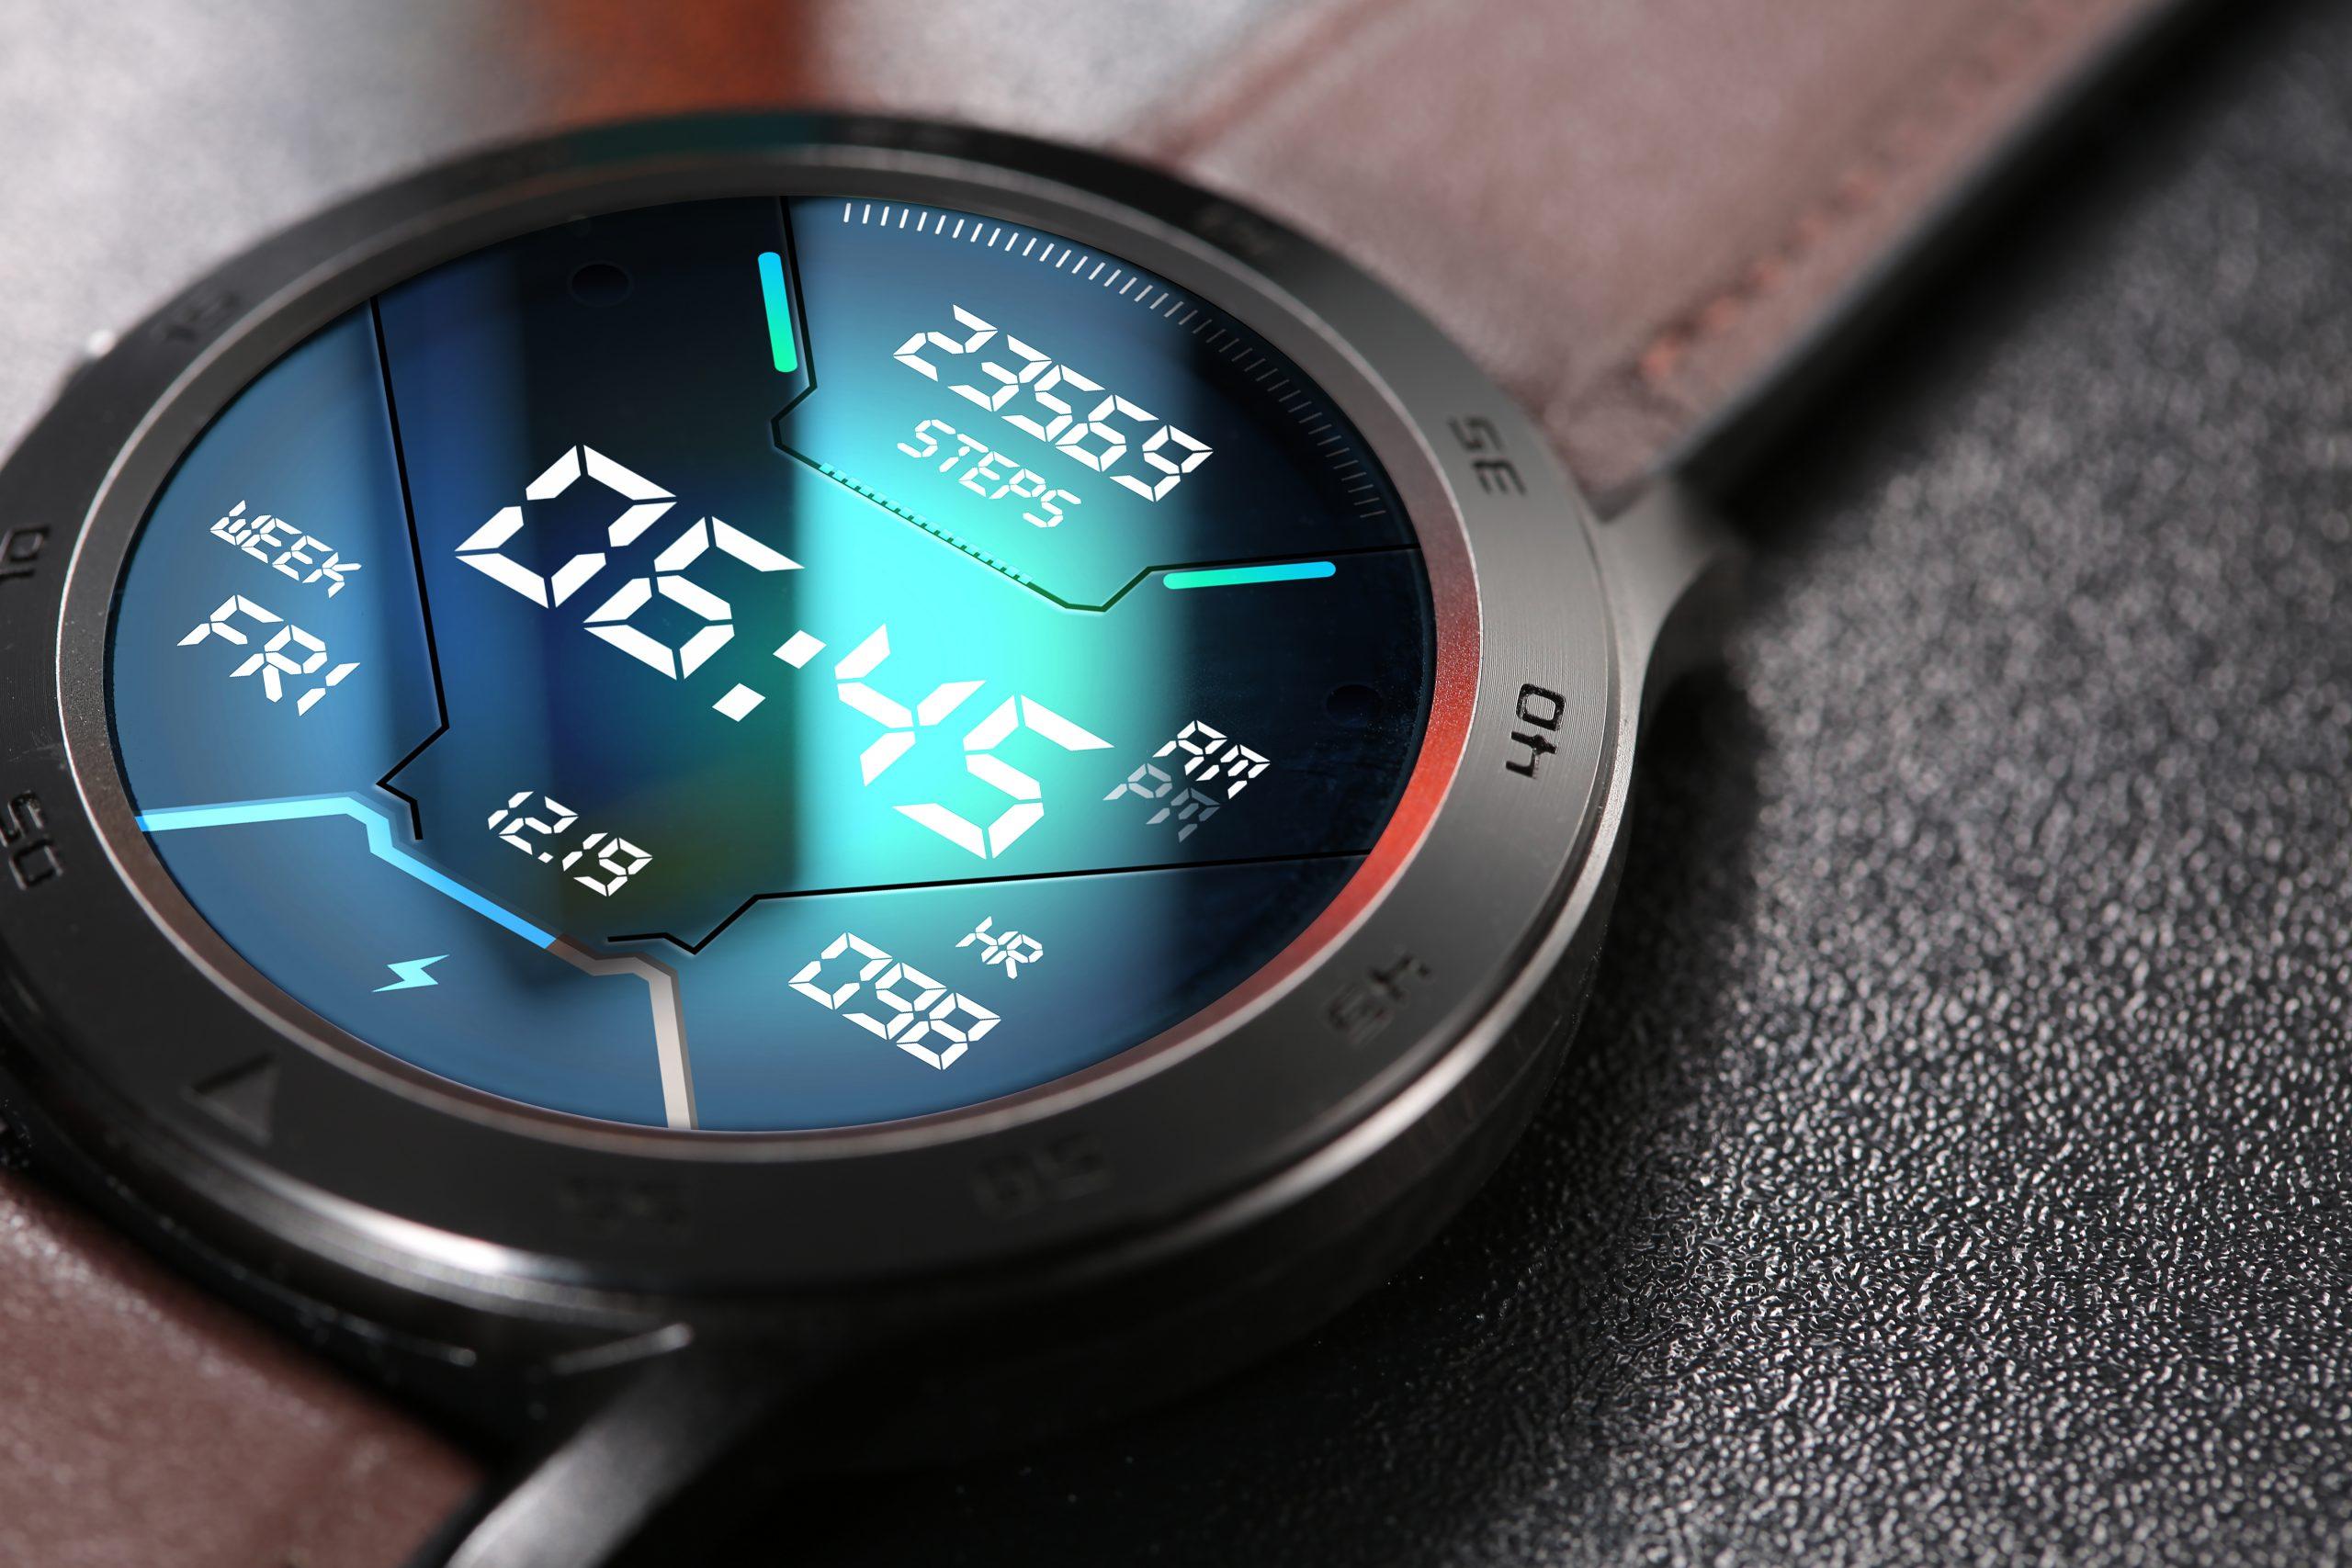 70B1408190096 scaled - ساعت هوشمند DT98